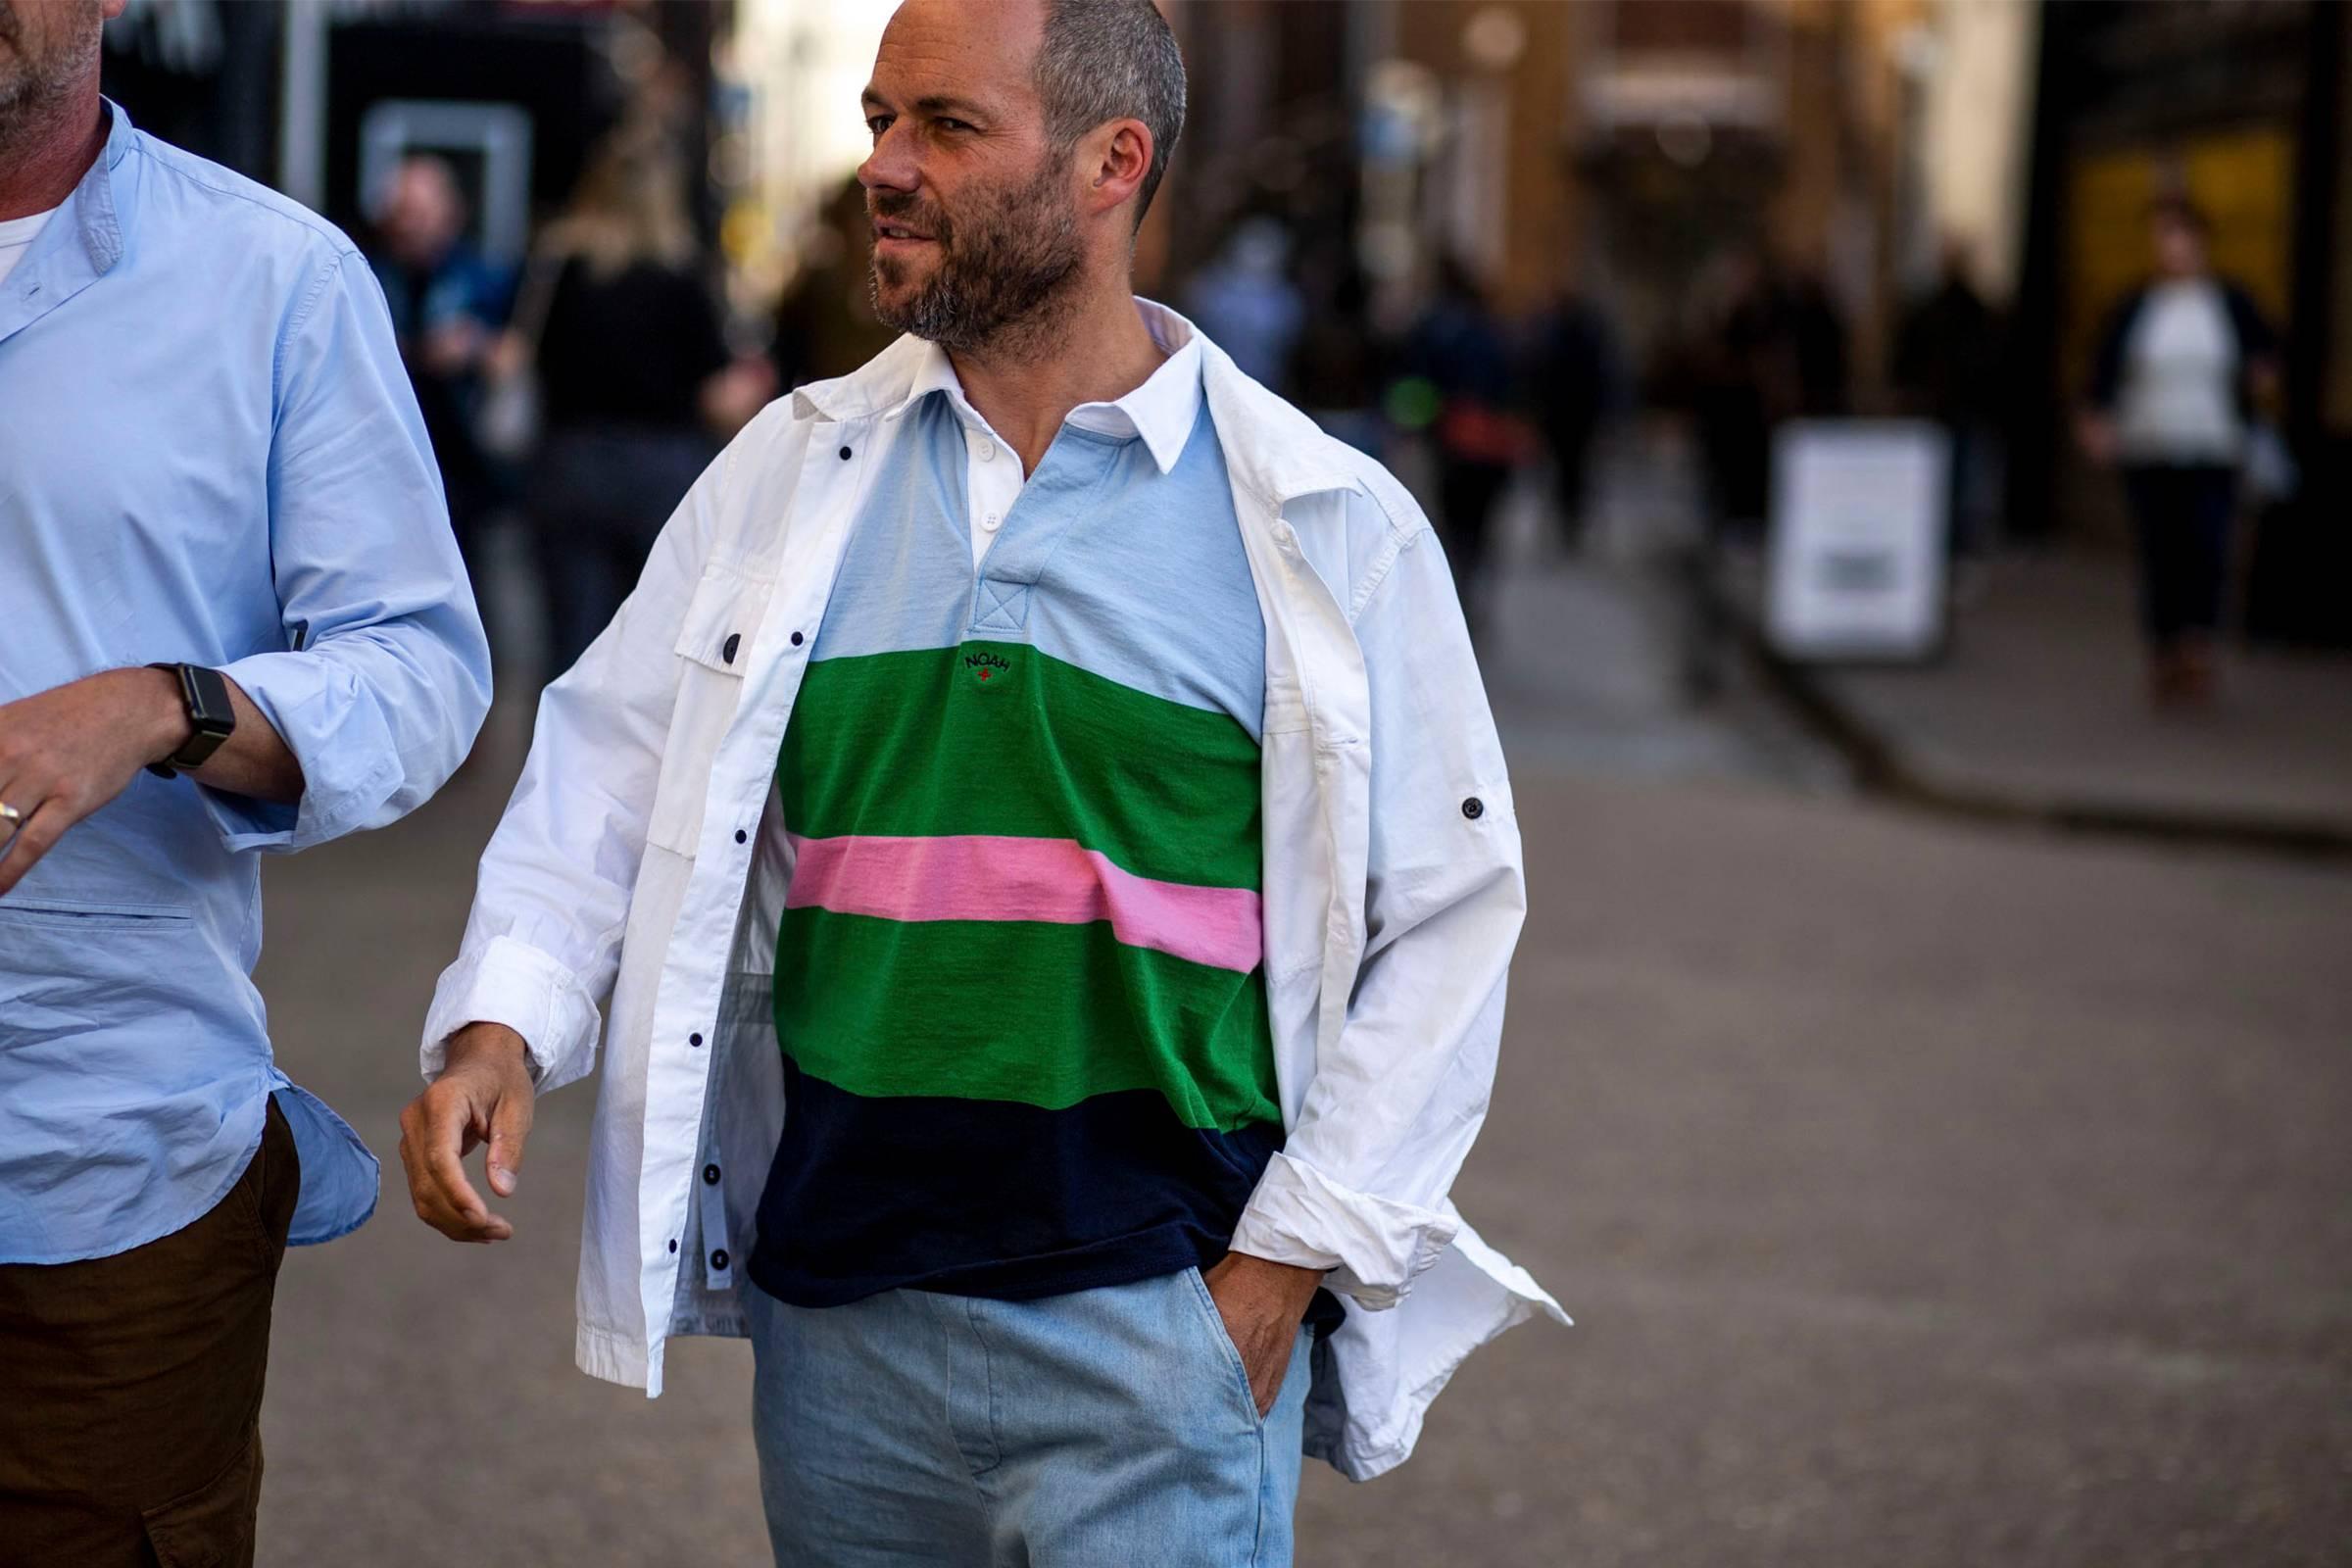 4. Grown Up Streetwear